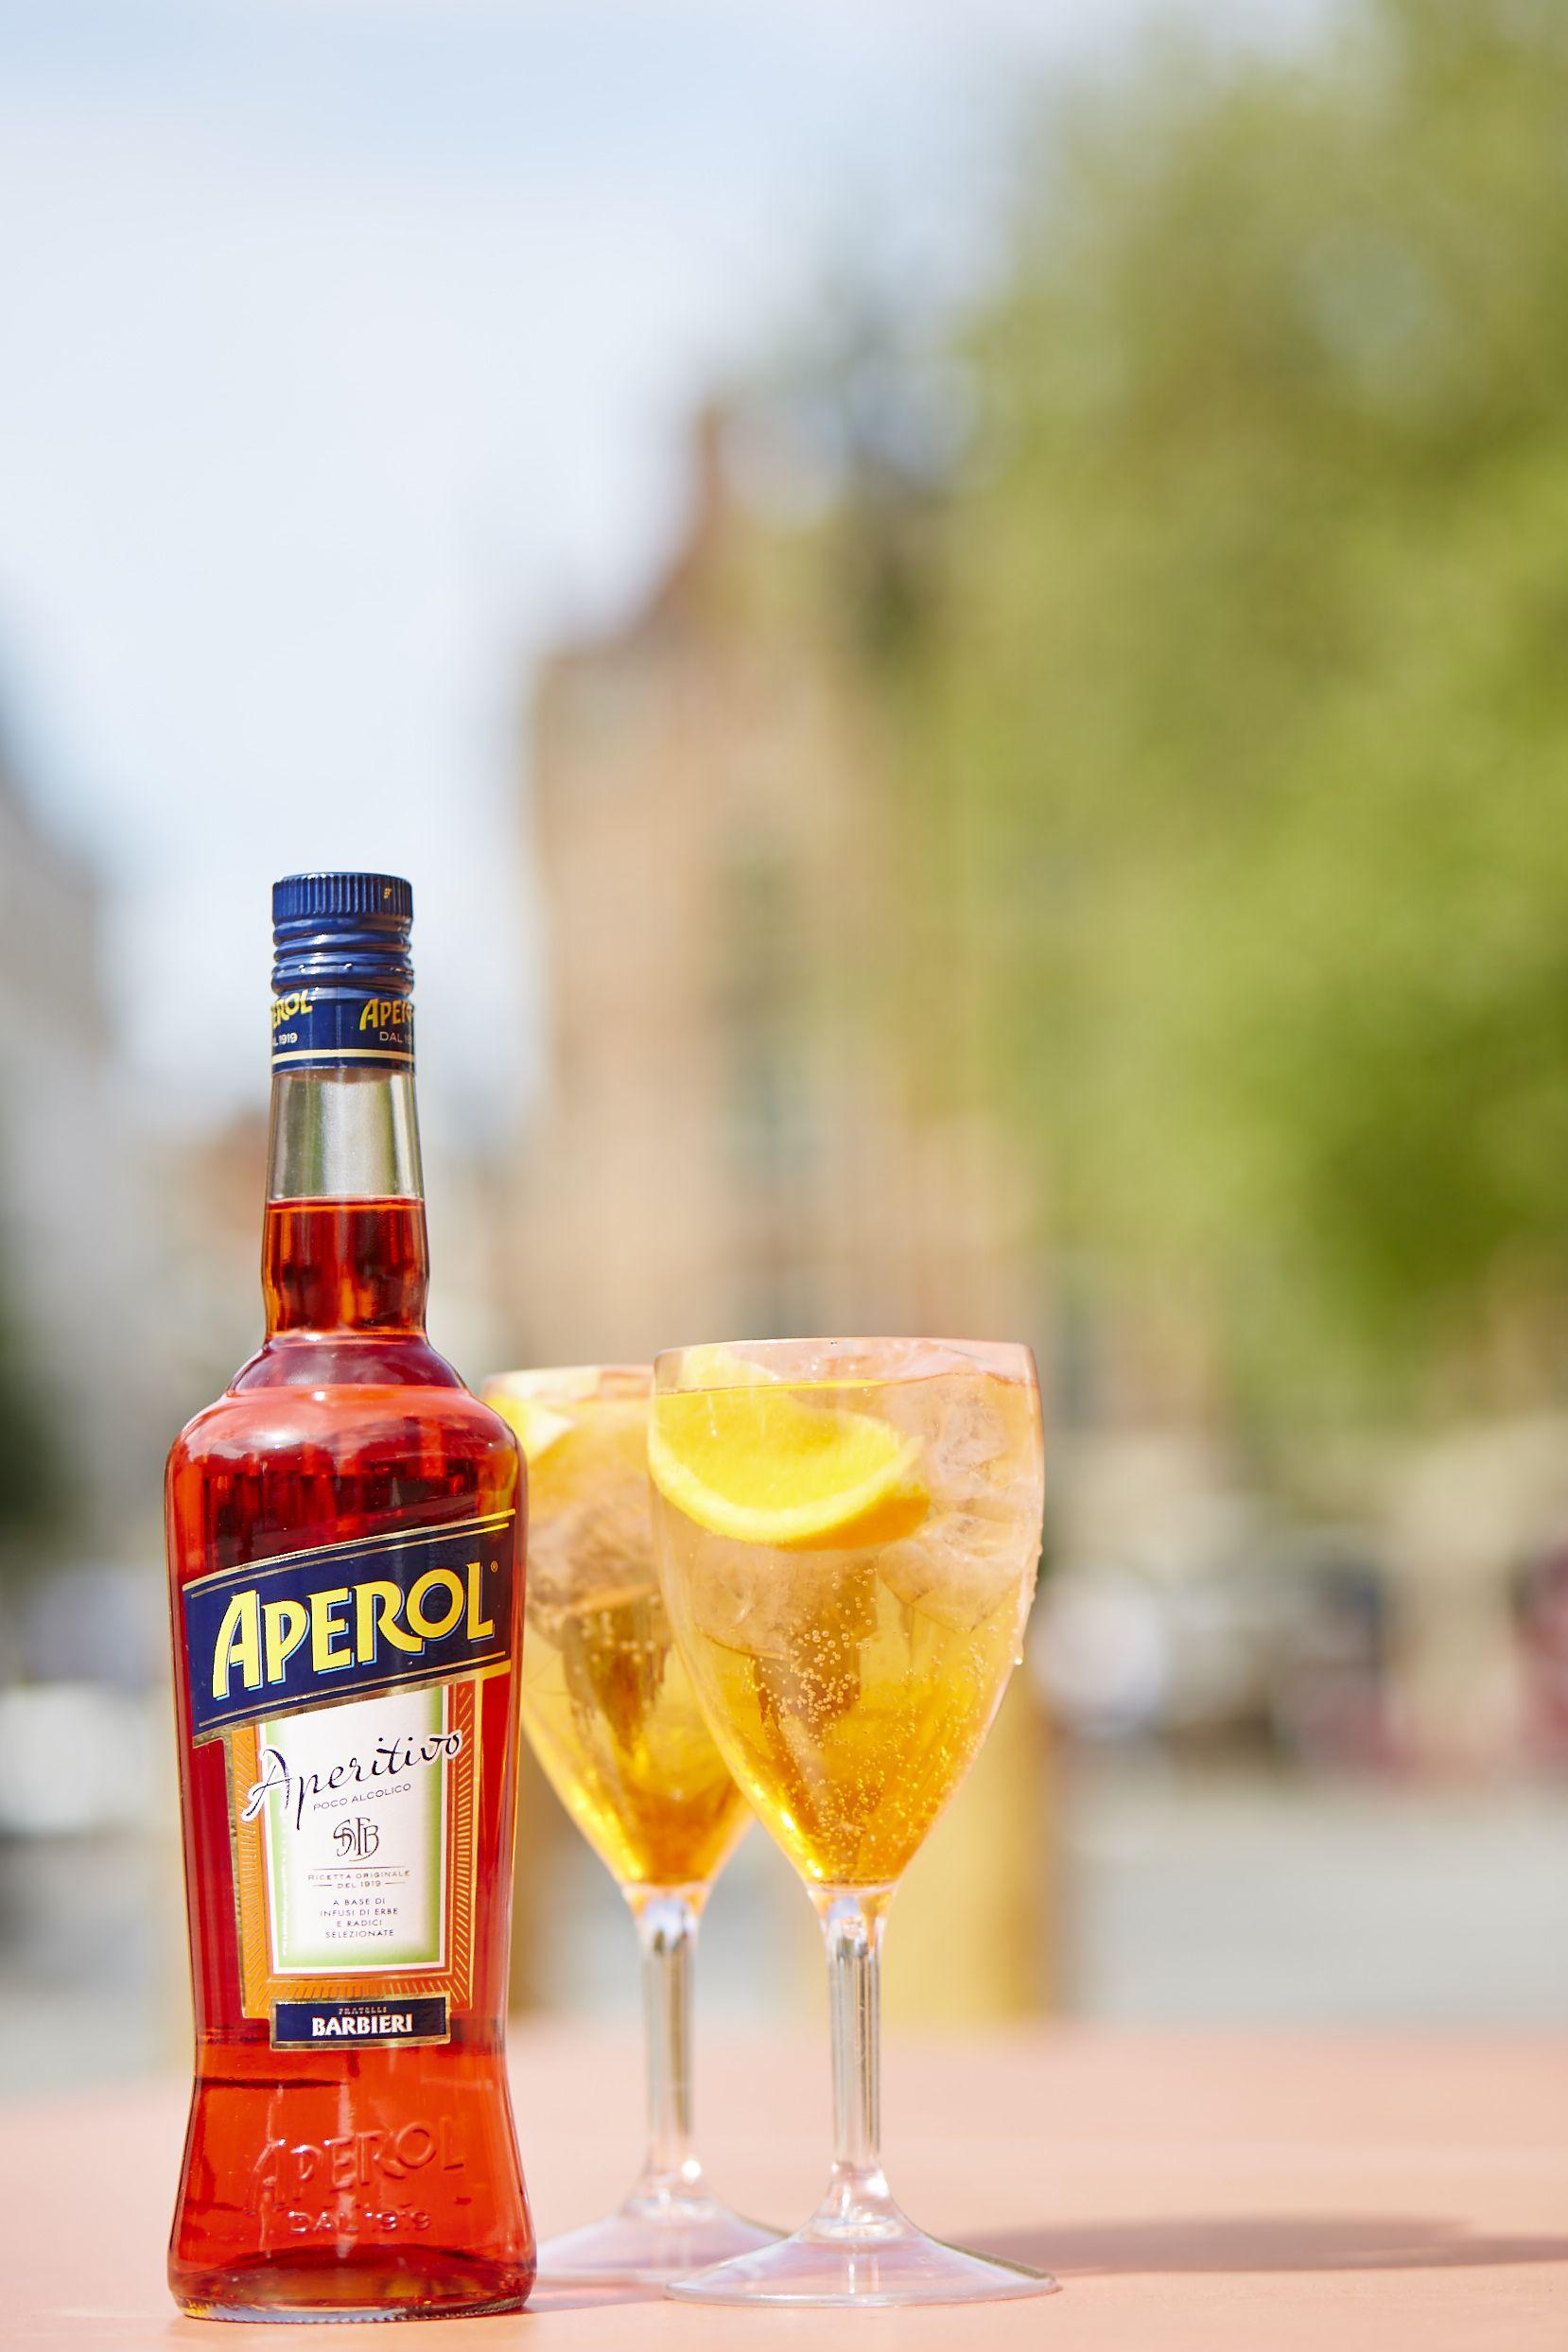 Summer + Aperol Spritz = the perfect post-work combination.  #easy #summer #cocktail #beverage #drink #aperol #aperolspritz #prosecco #orange